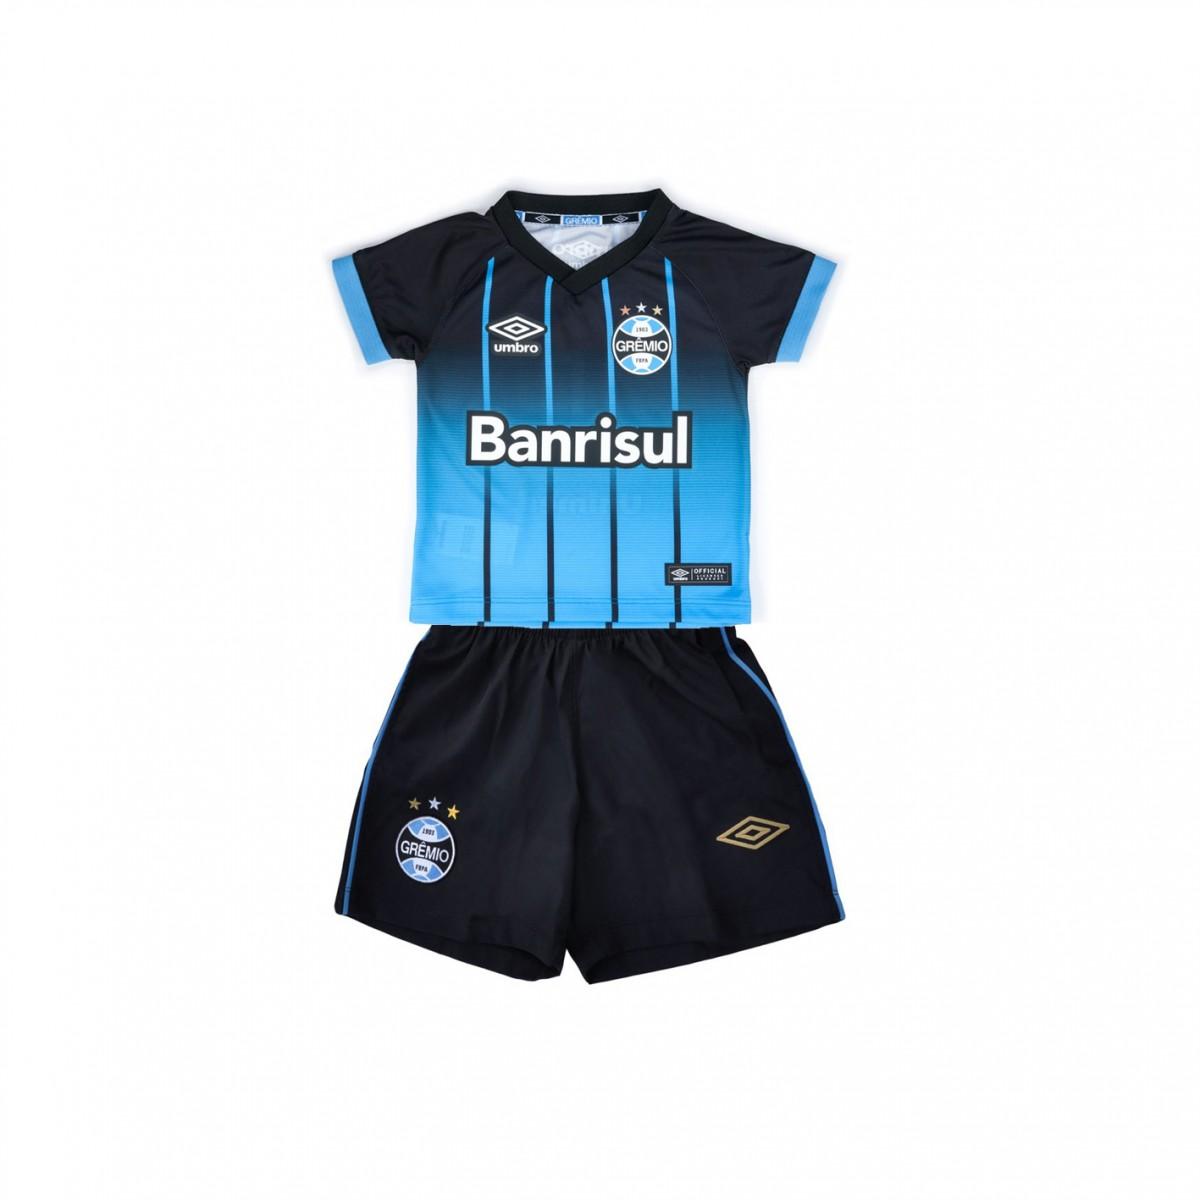 e89d29482b Kit Infantil Umbro Grêmio Oficial 2016 3G04008 - Preto Azul Branco ...